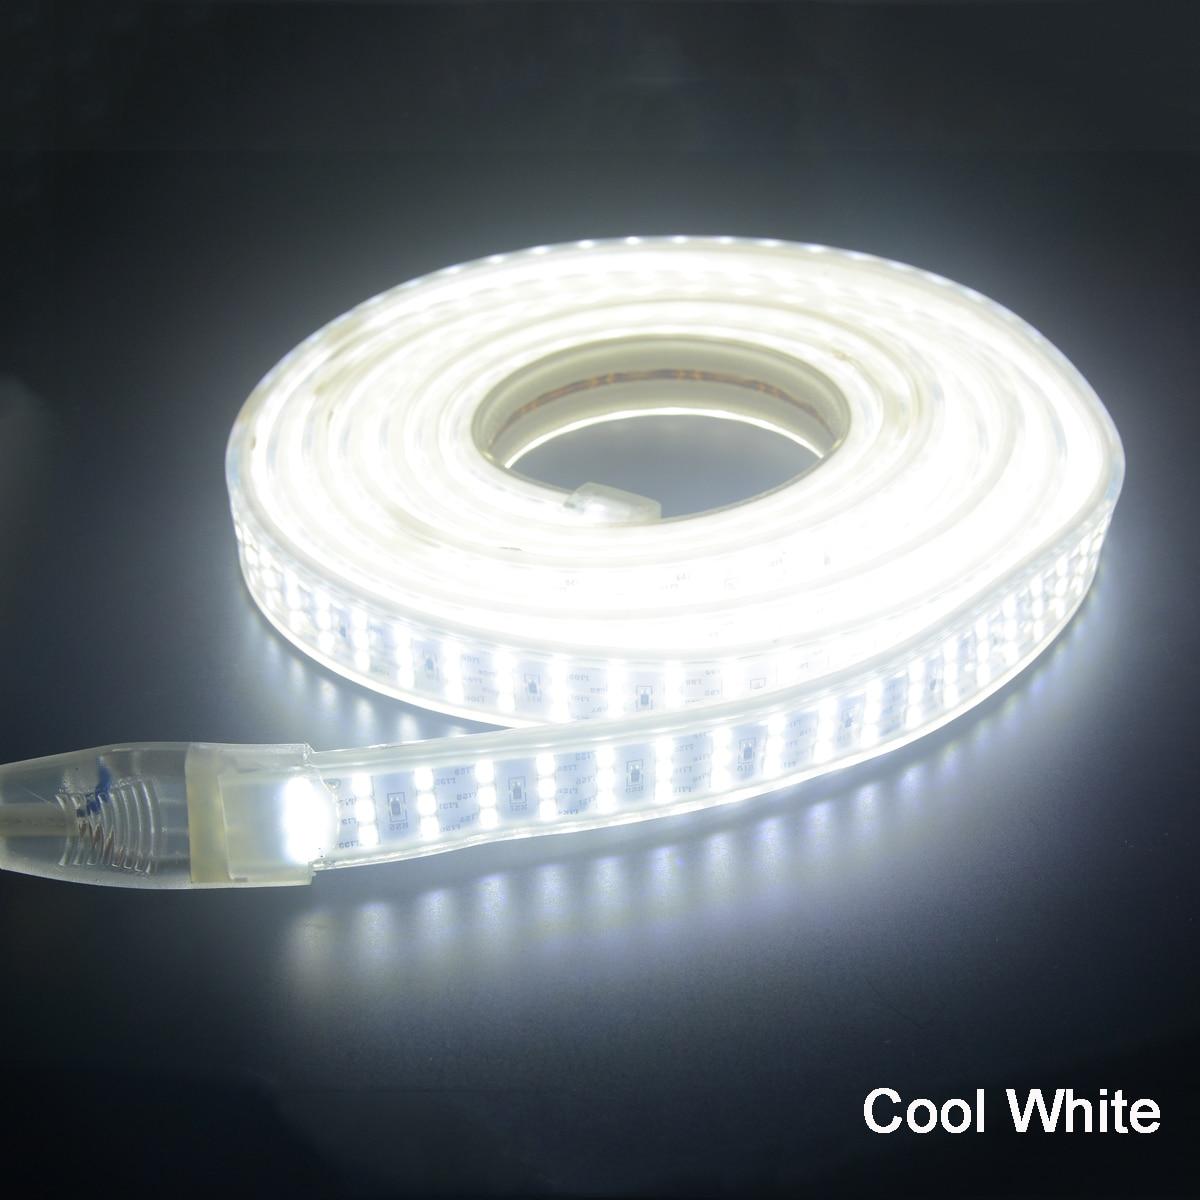 Led strip Licht 220v SMD 2835 flexibele tape 276 leds/m 1m 2m 4m 5m 6m 7m 8m 9m + Power EU plug